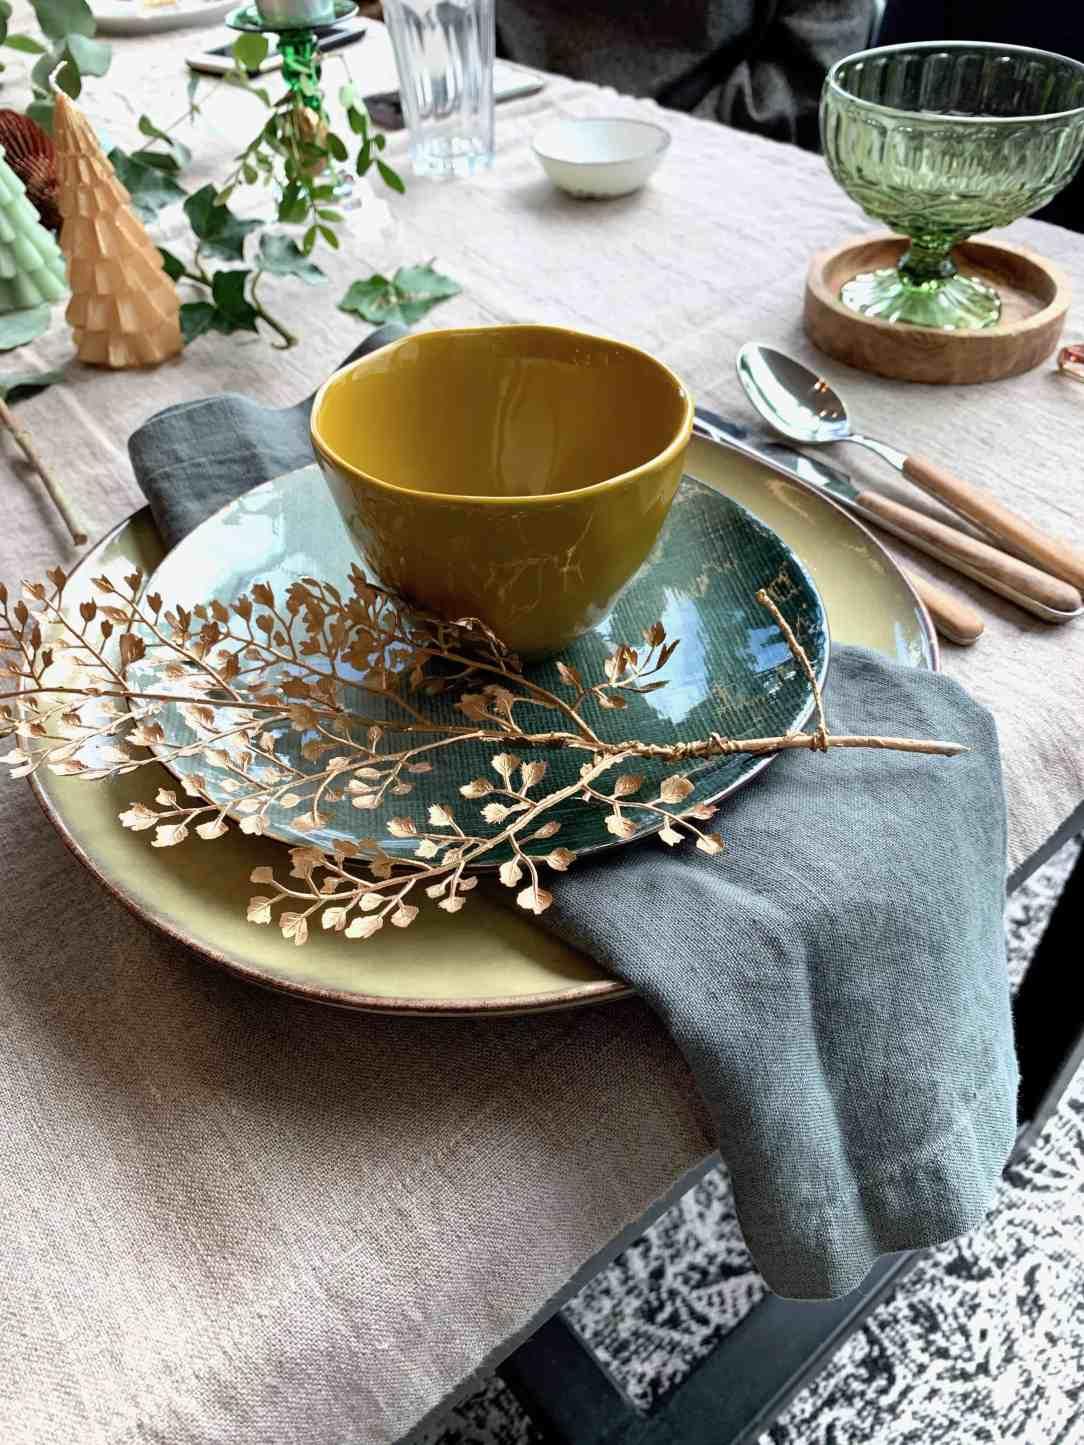 Groen en goud tafelstyling